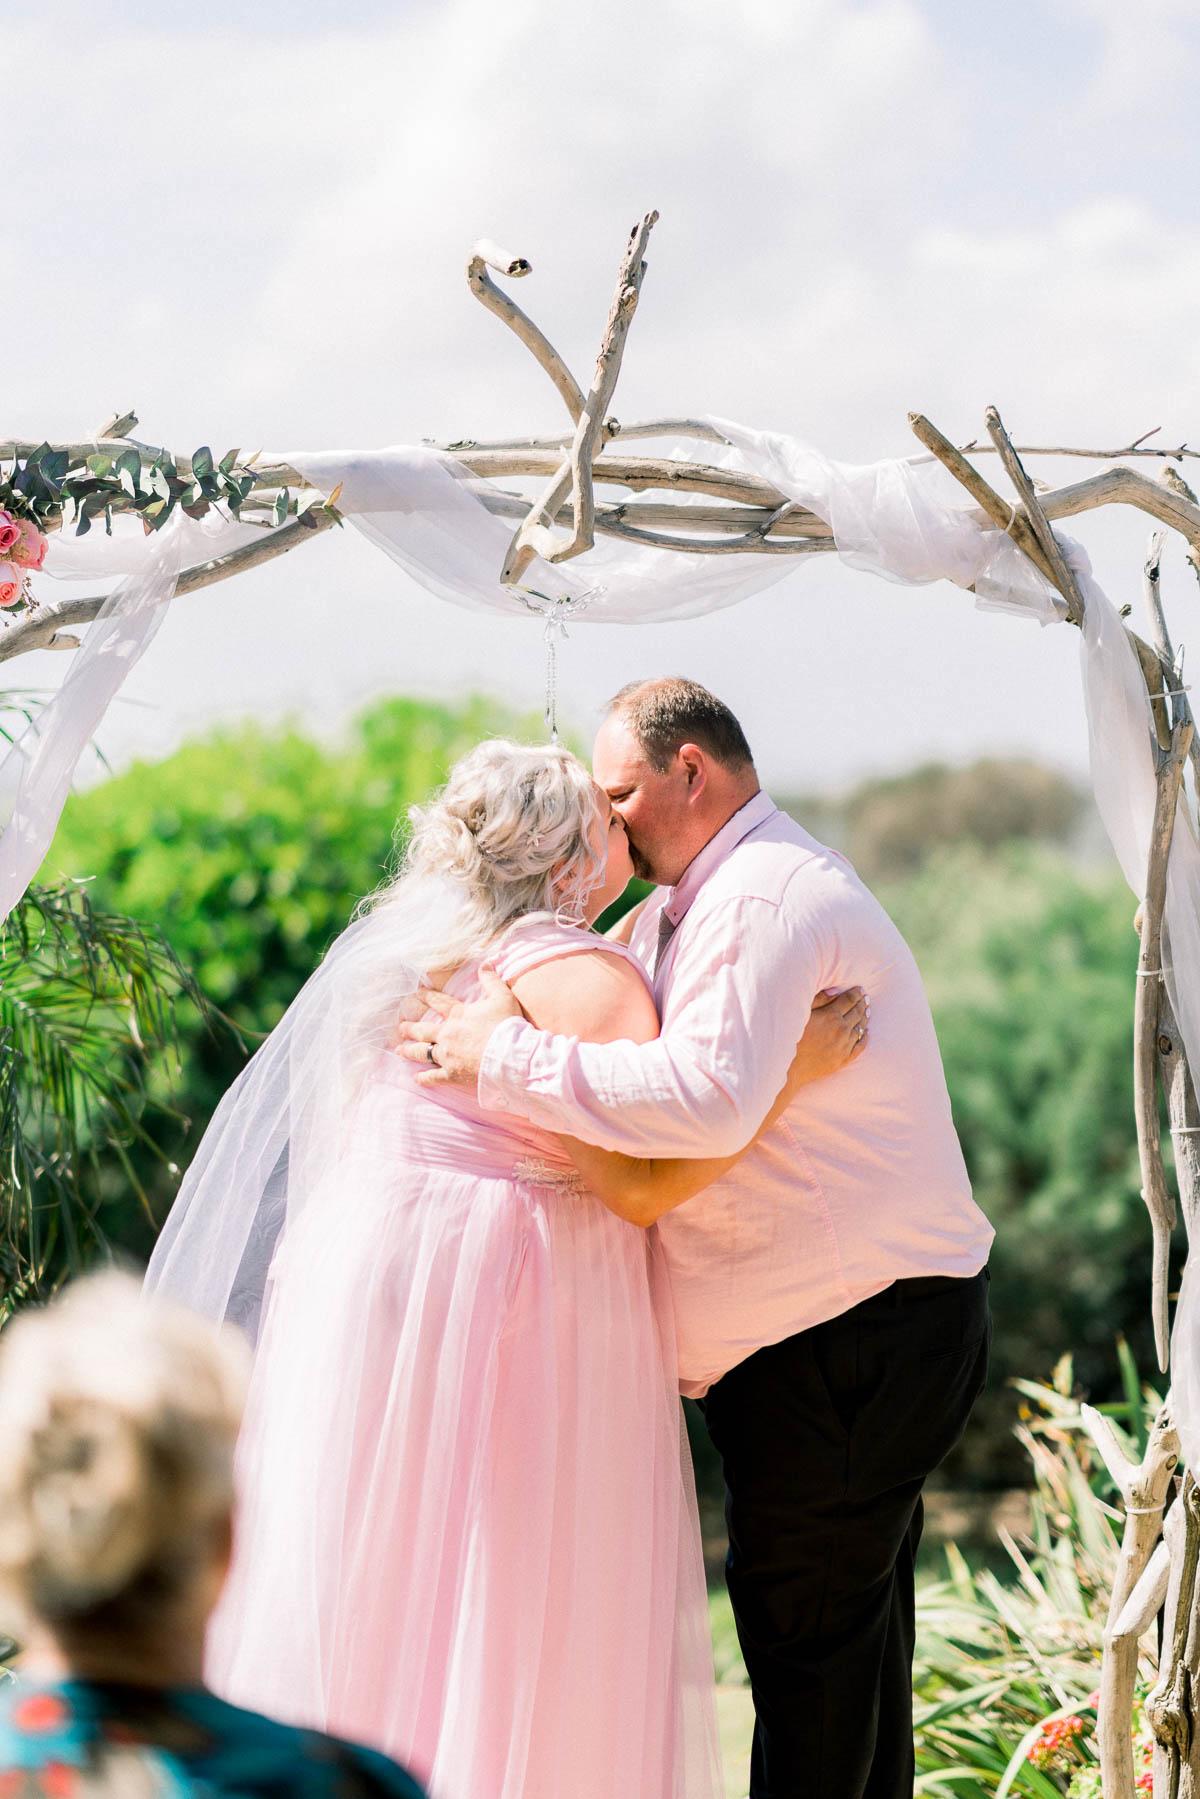 mt-eliza-mornington-peninsula-backyard-wedding-heart+soul-weddings-allison-matt-03337.jpg